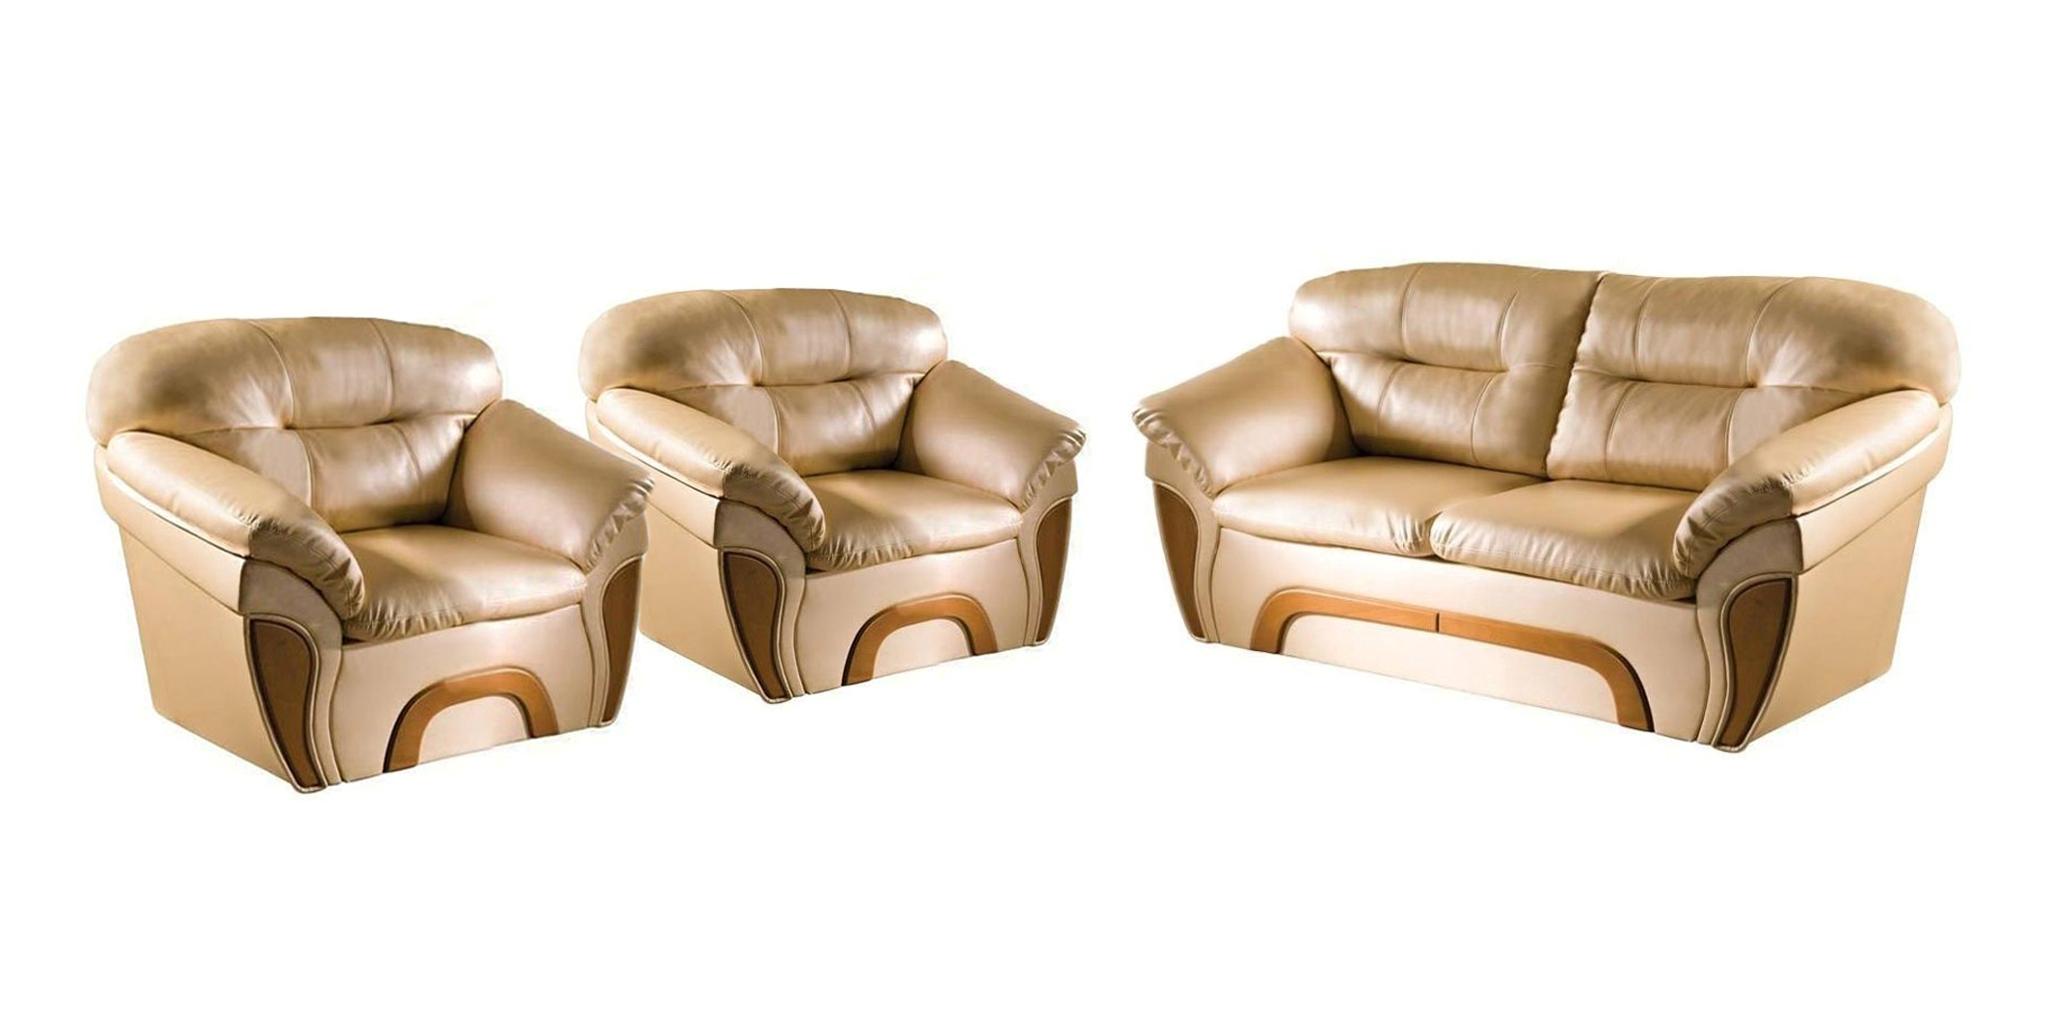 Комплект мягкой мебели Миранда